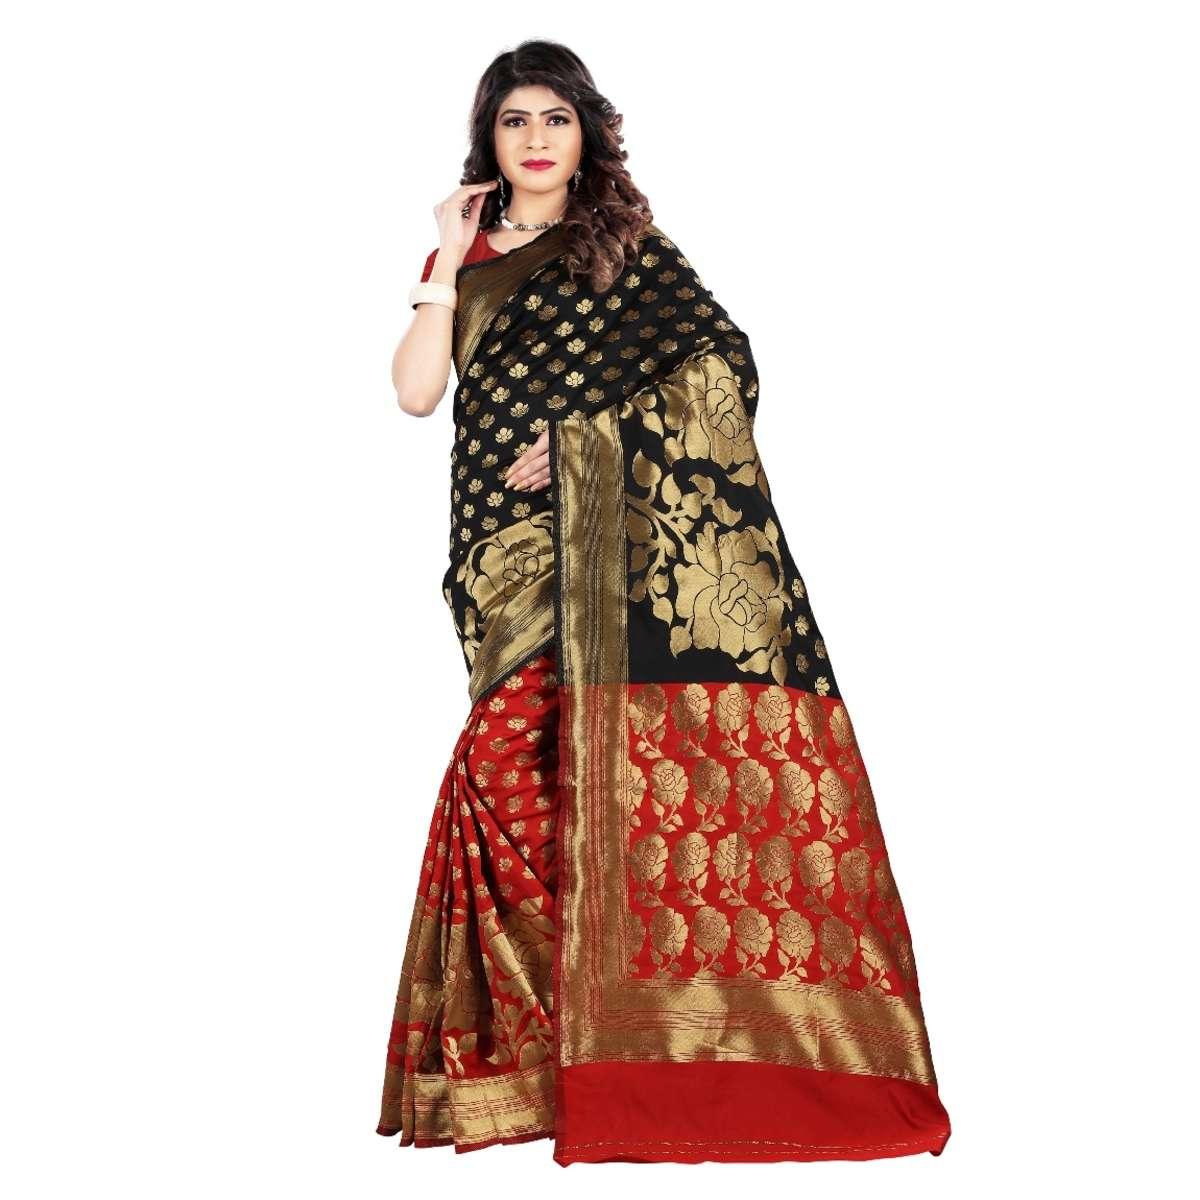 Fashion accessories wholesale india 67